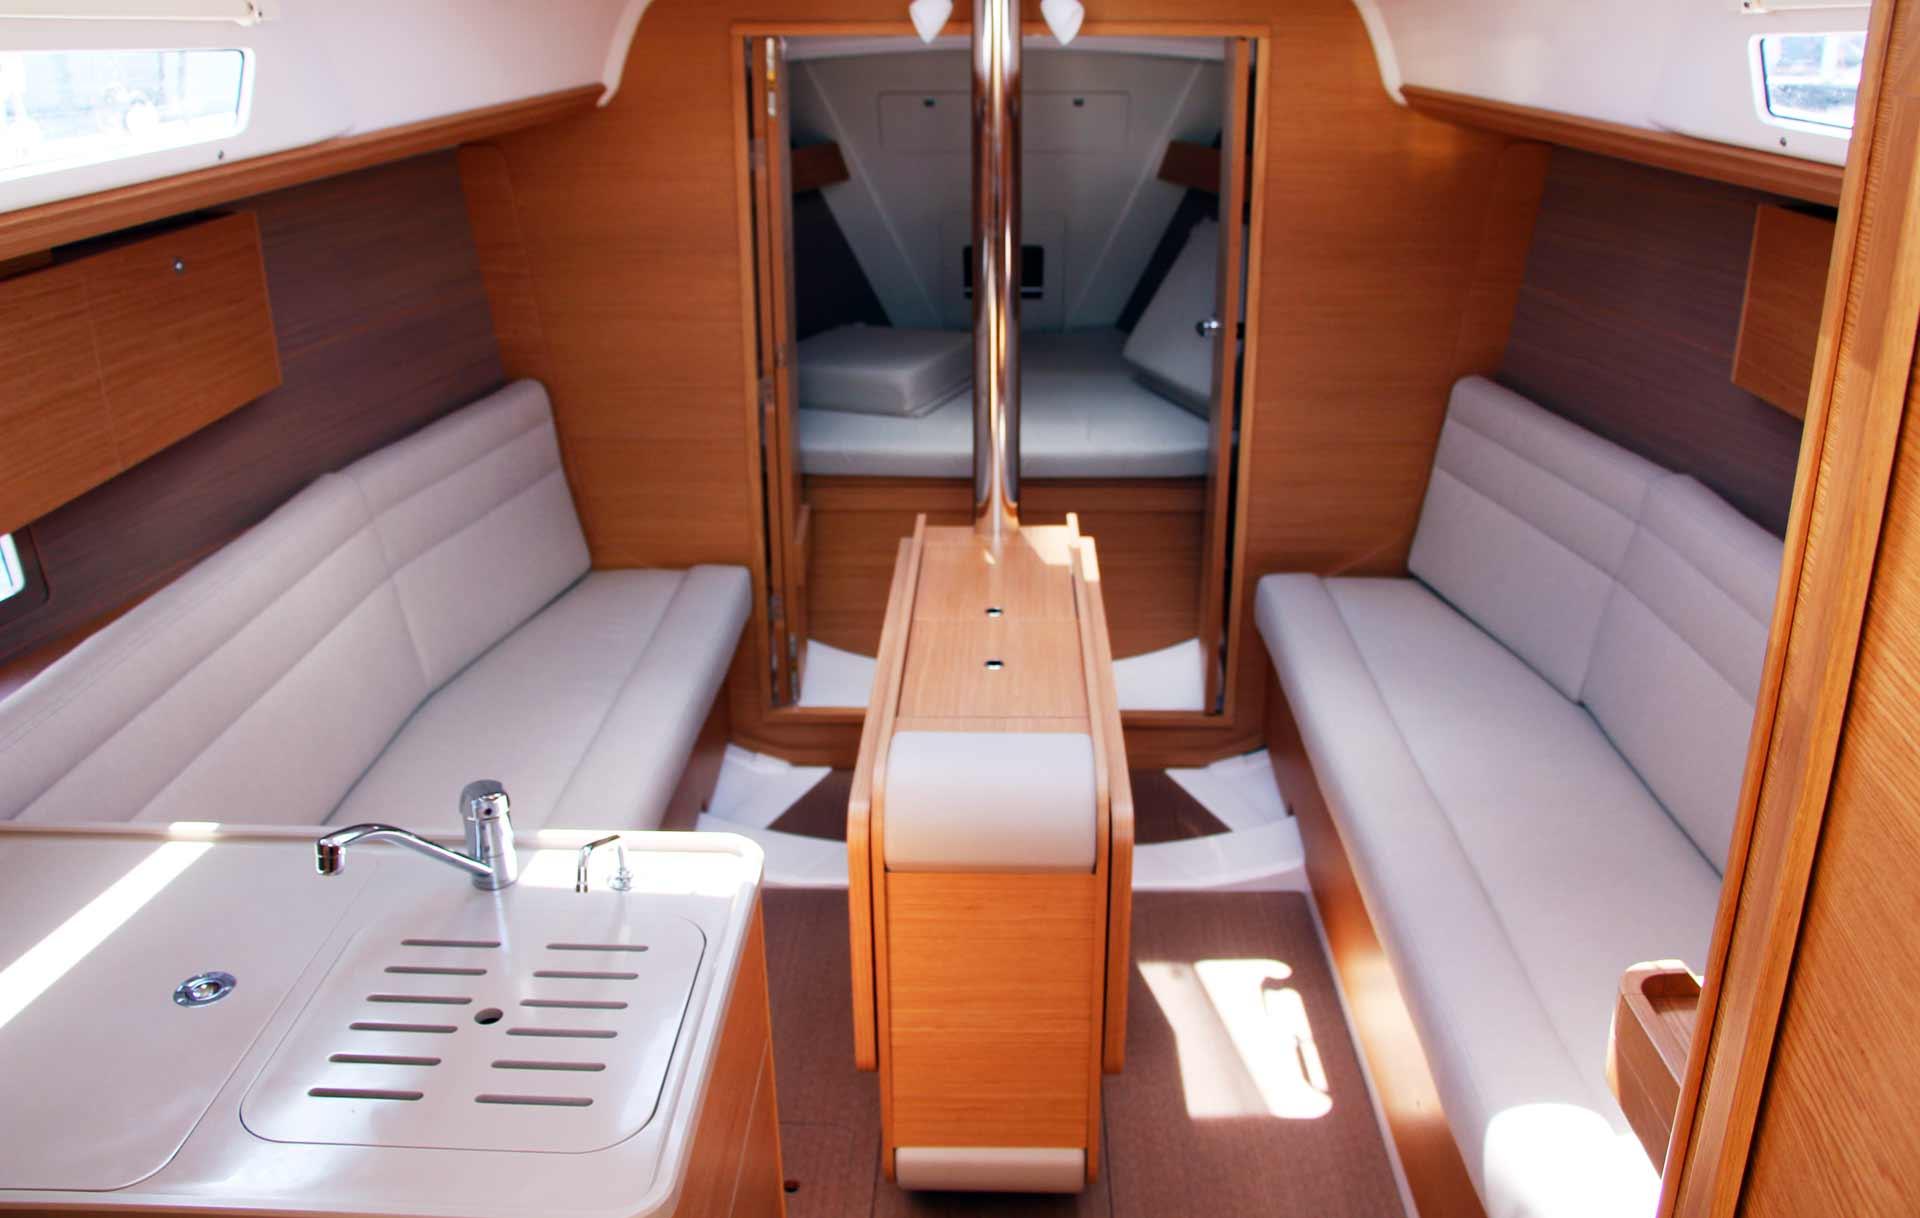 Utilizaton of the interior space is exemplary